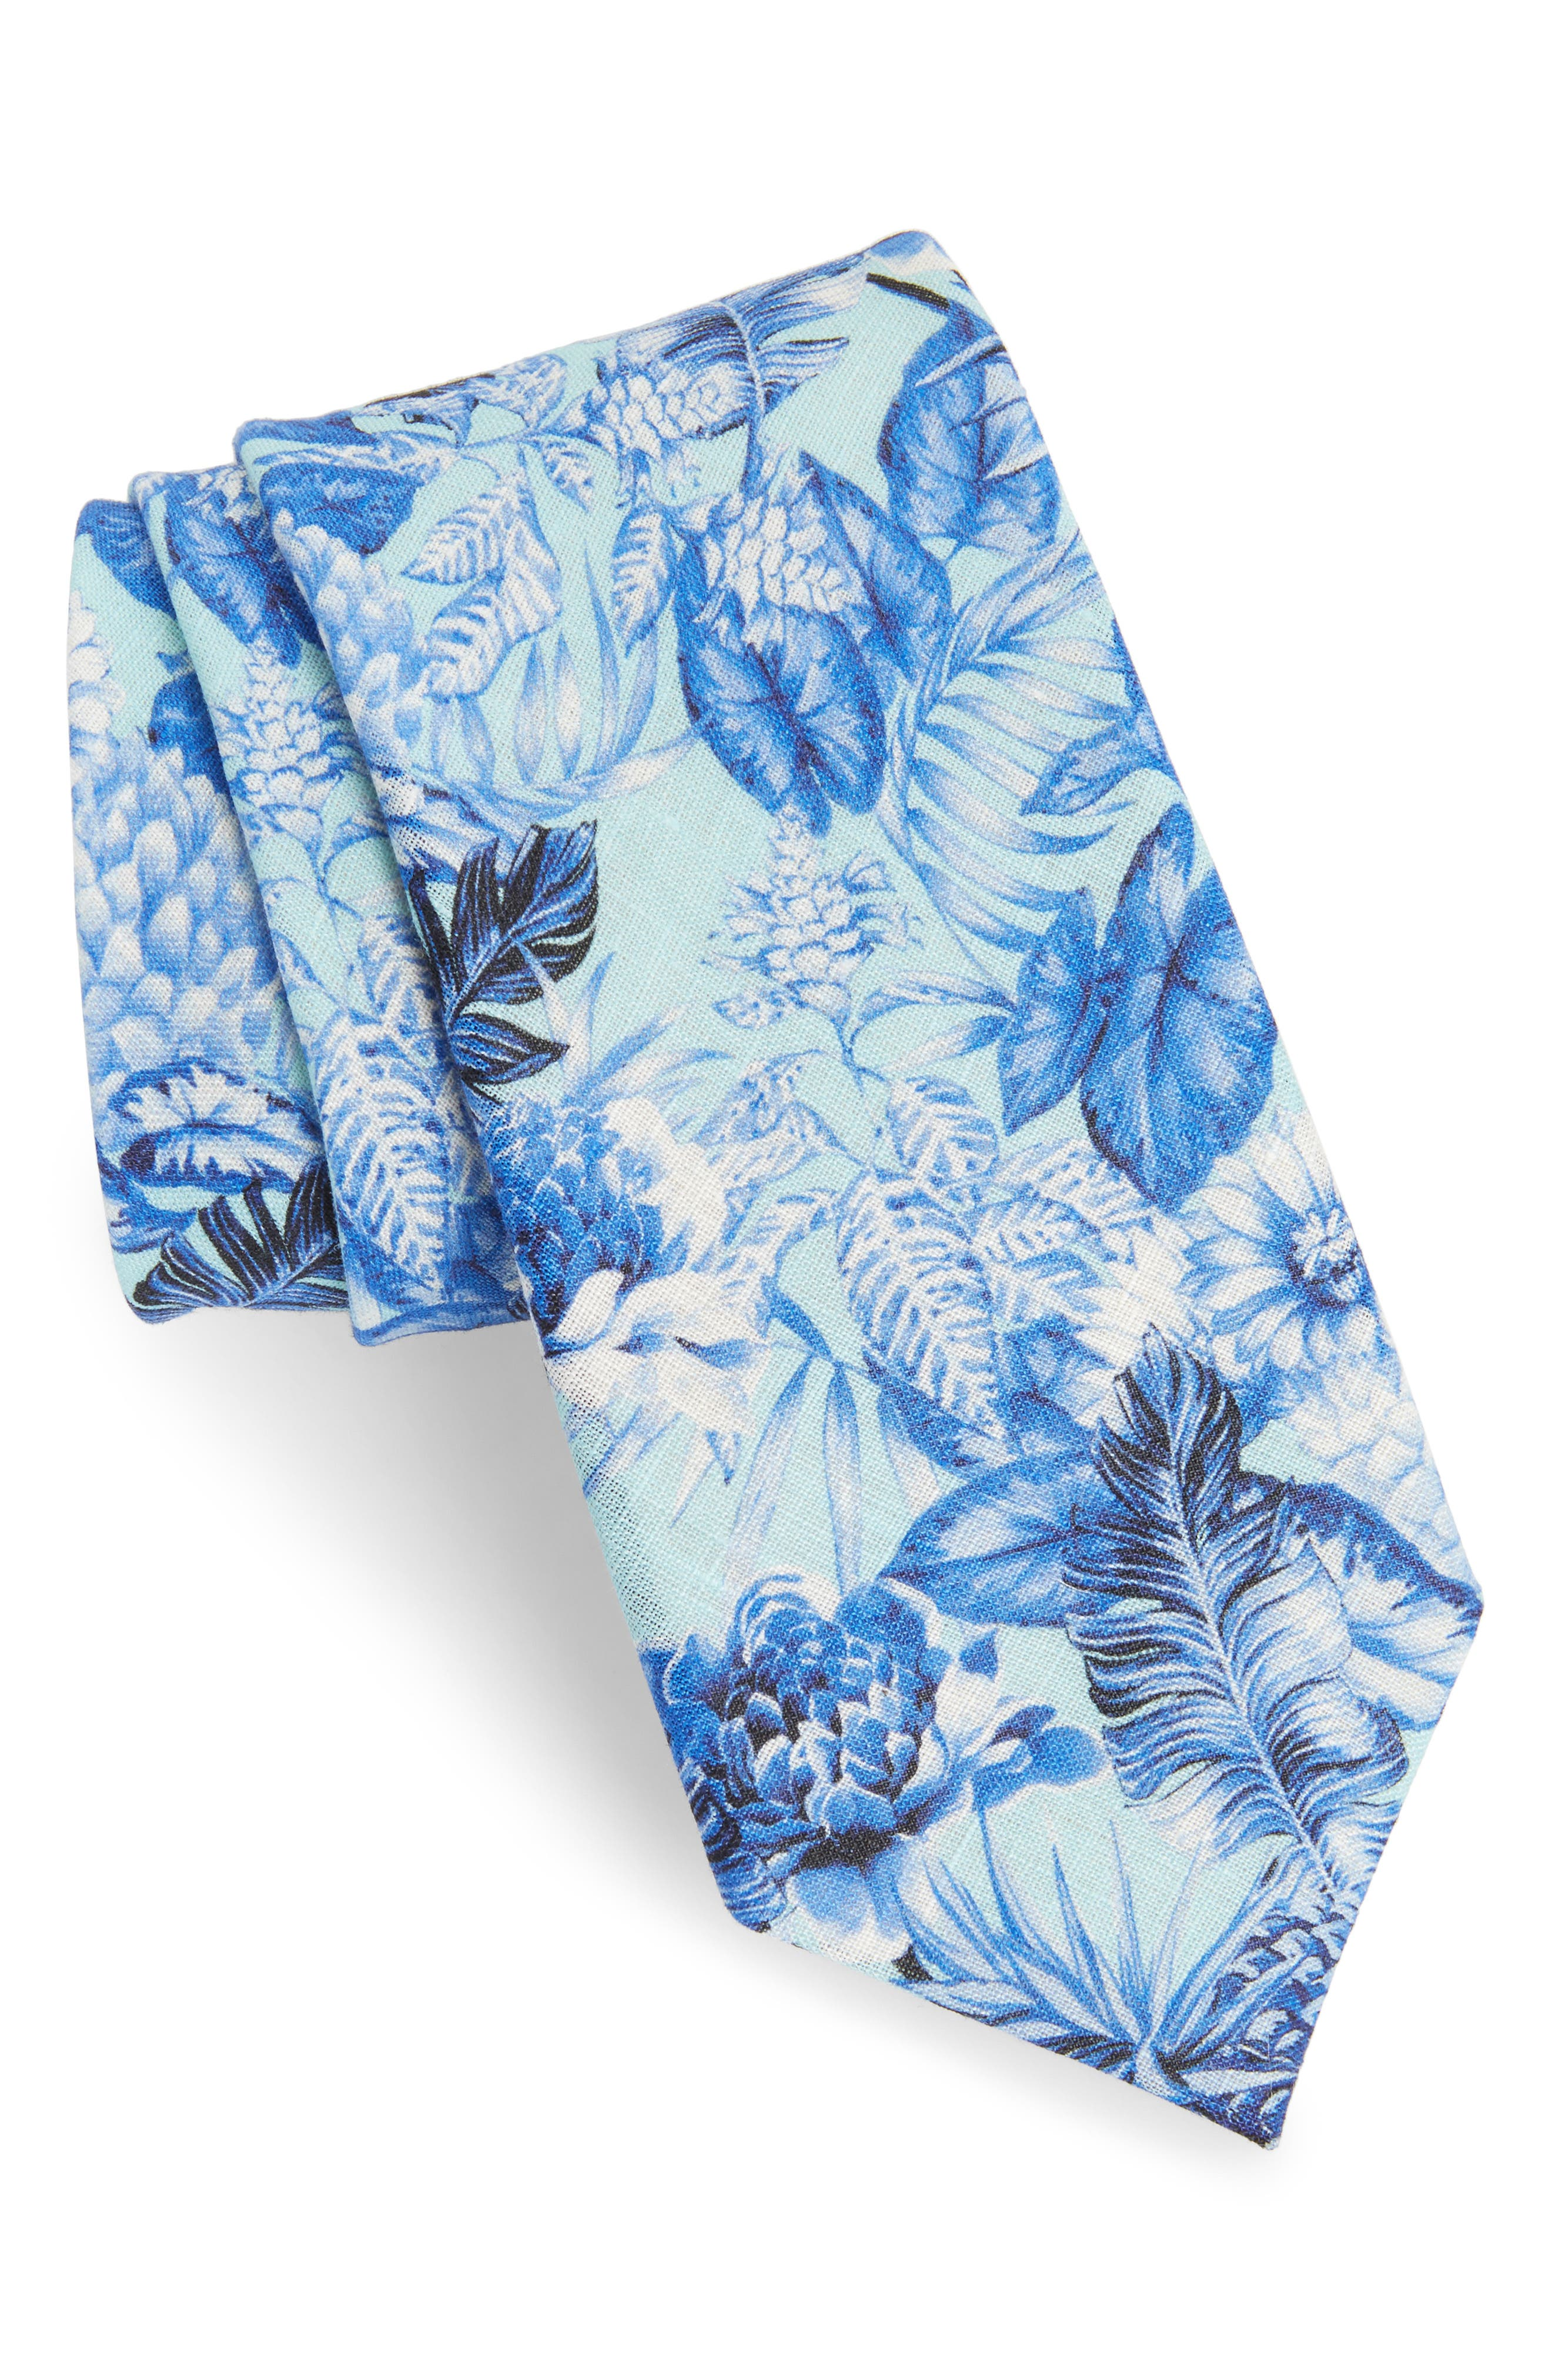 Tropic Fever Linen Tie,                         Main,                         color, Island Paradise